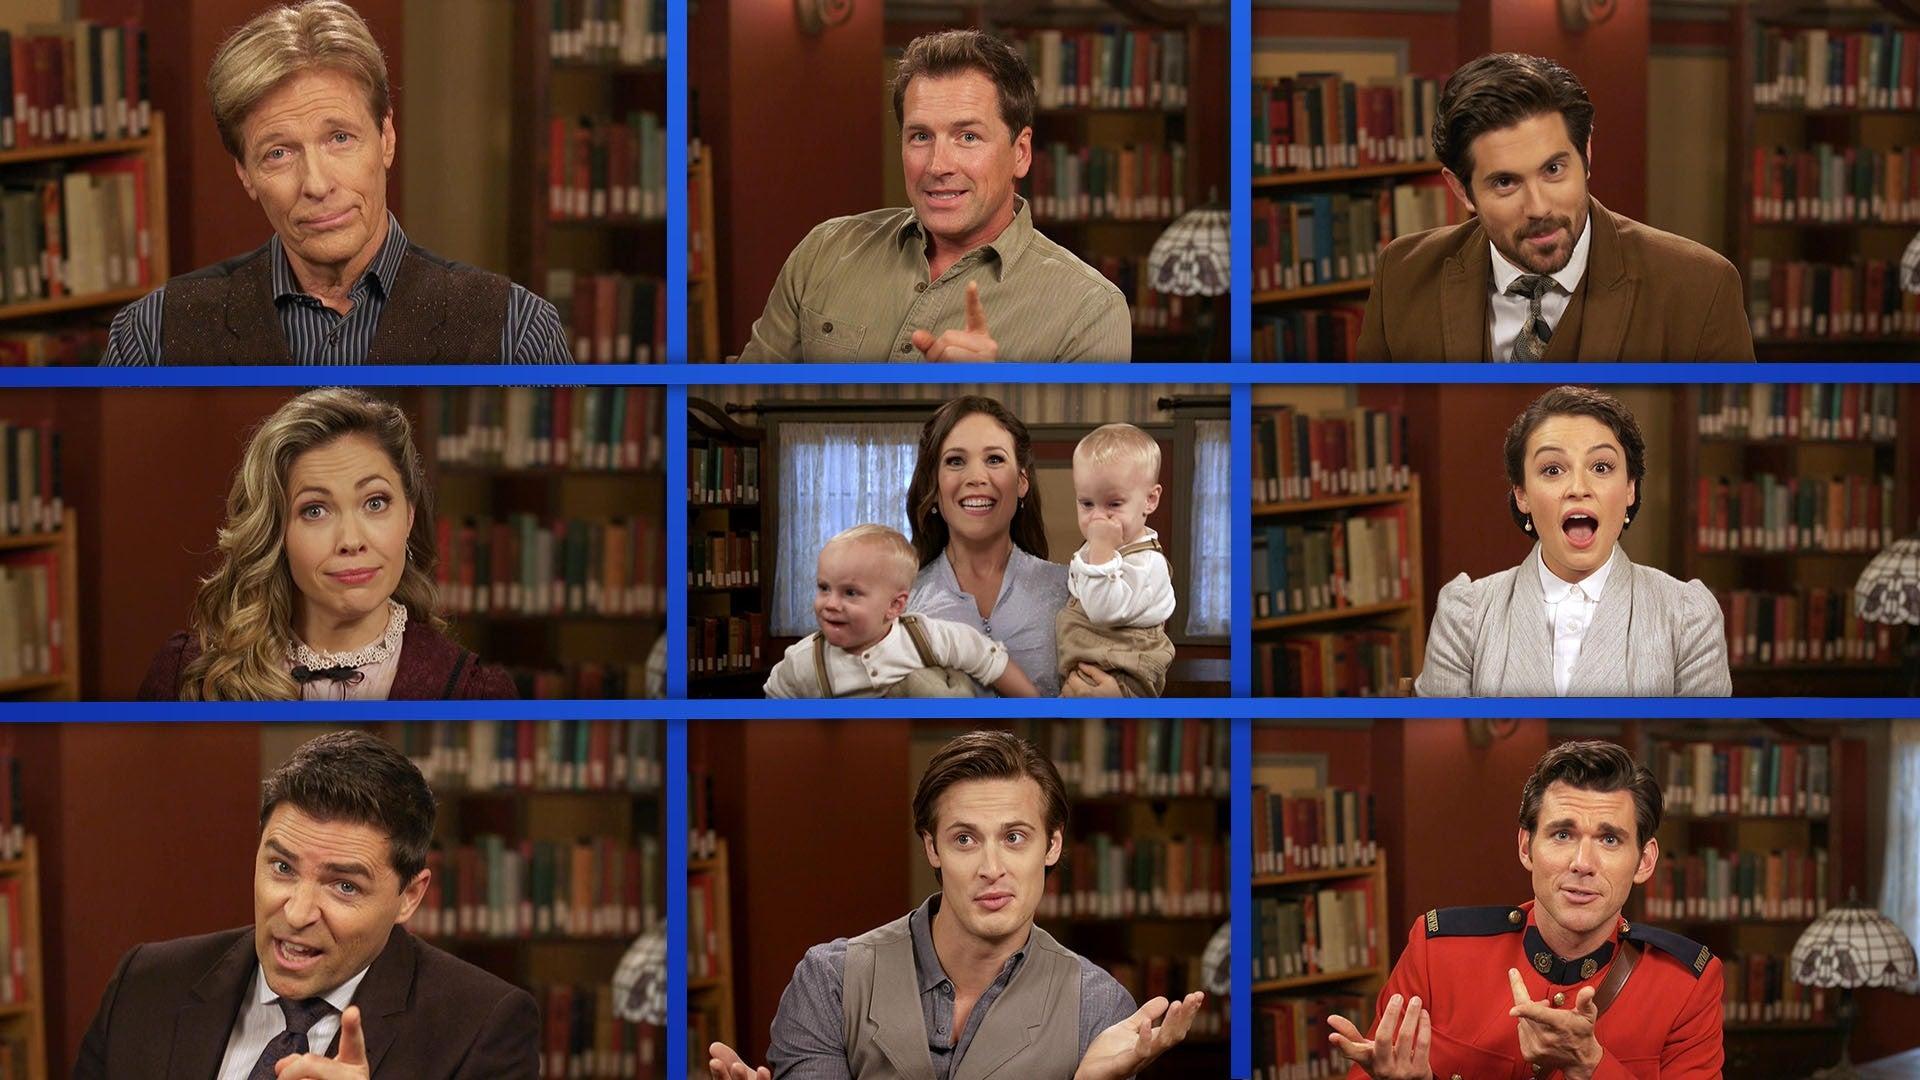 When Calls The Heart Christmas Cast 2020 When Calls the Heart' Christmas Special First Look    See the